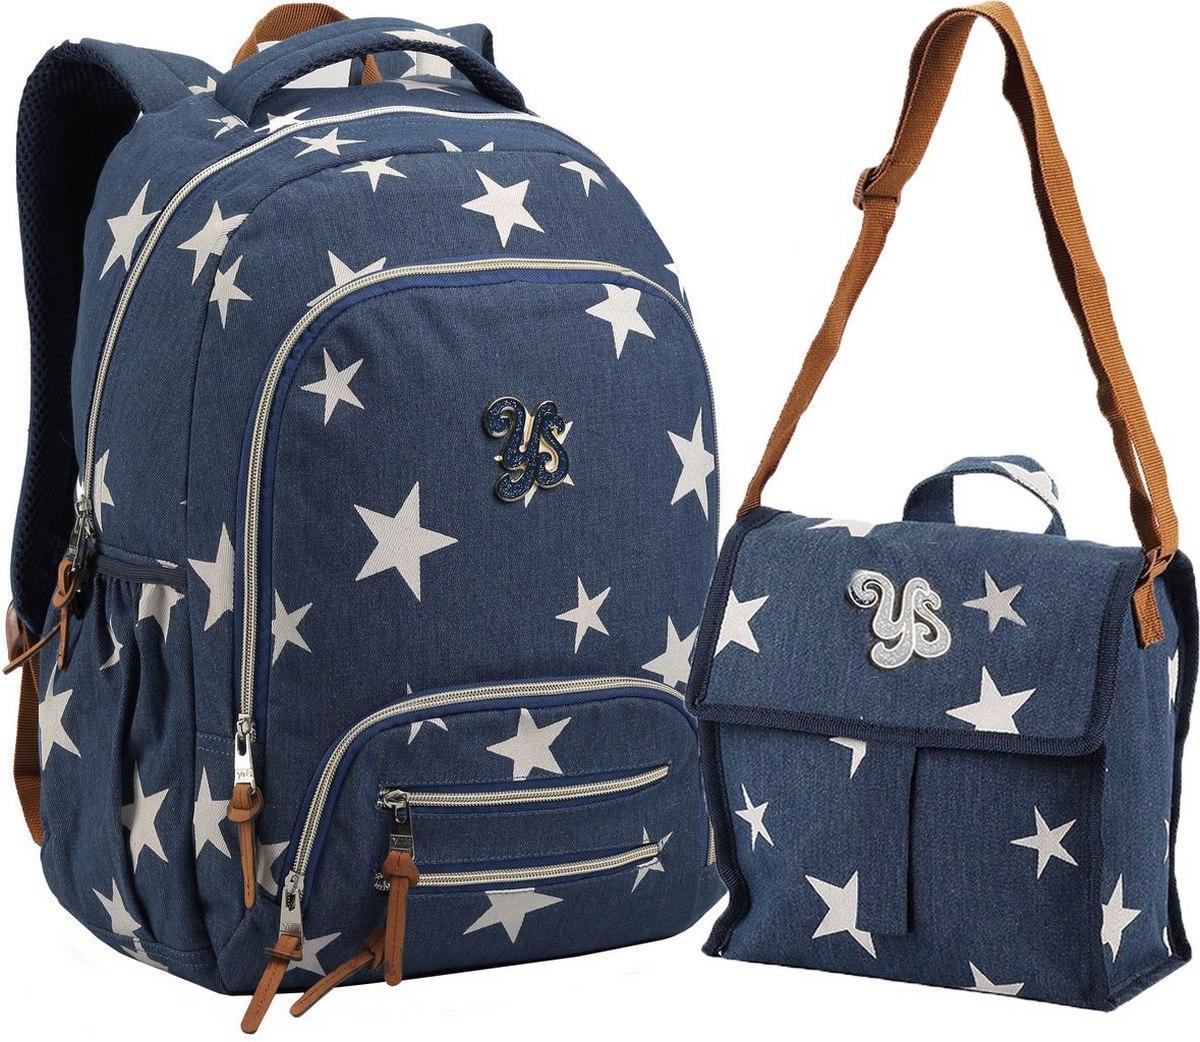 Kit Conjunto Mochila Feminina Escolar Juvenil Impermeável Grande Estrela Costas Azul + Lancheira Térmica Transversal Seanite